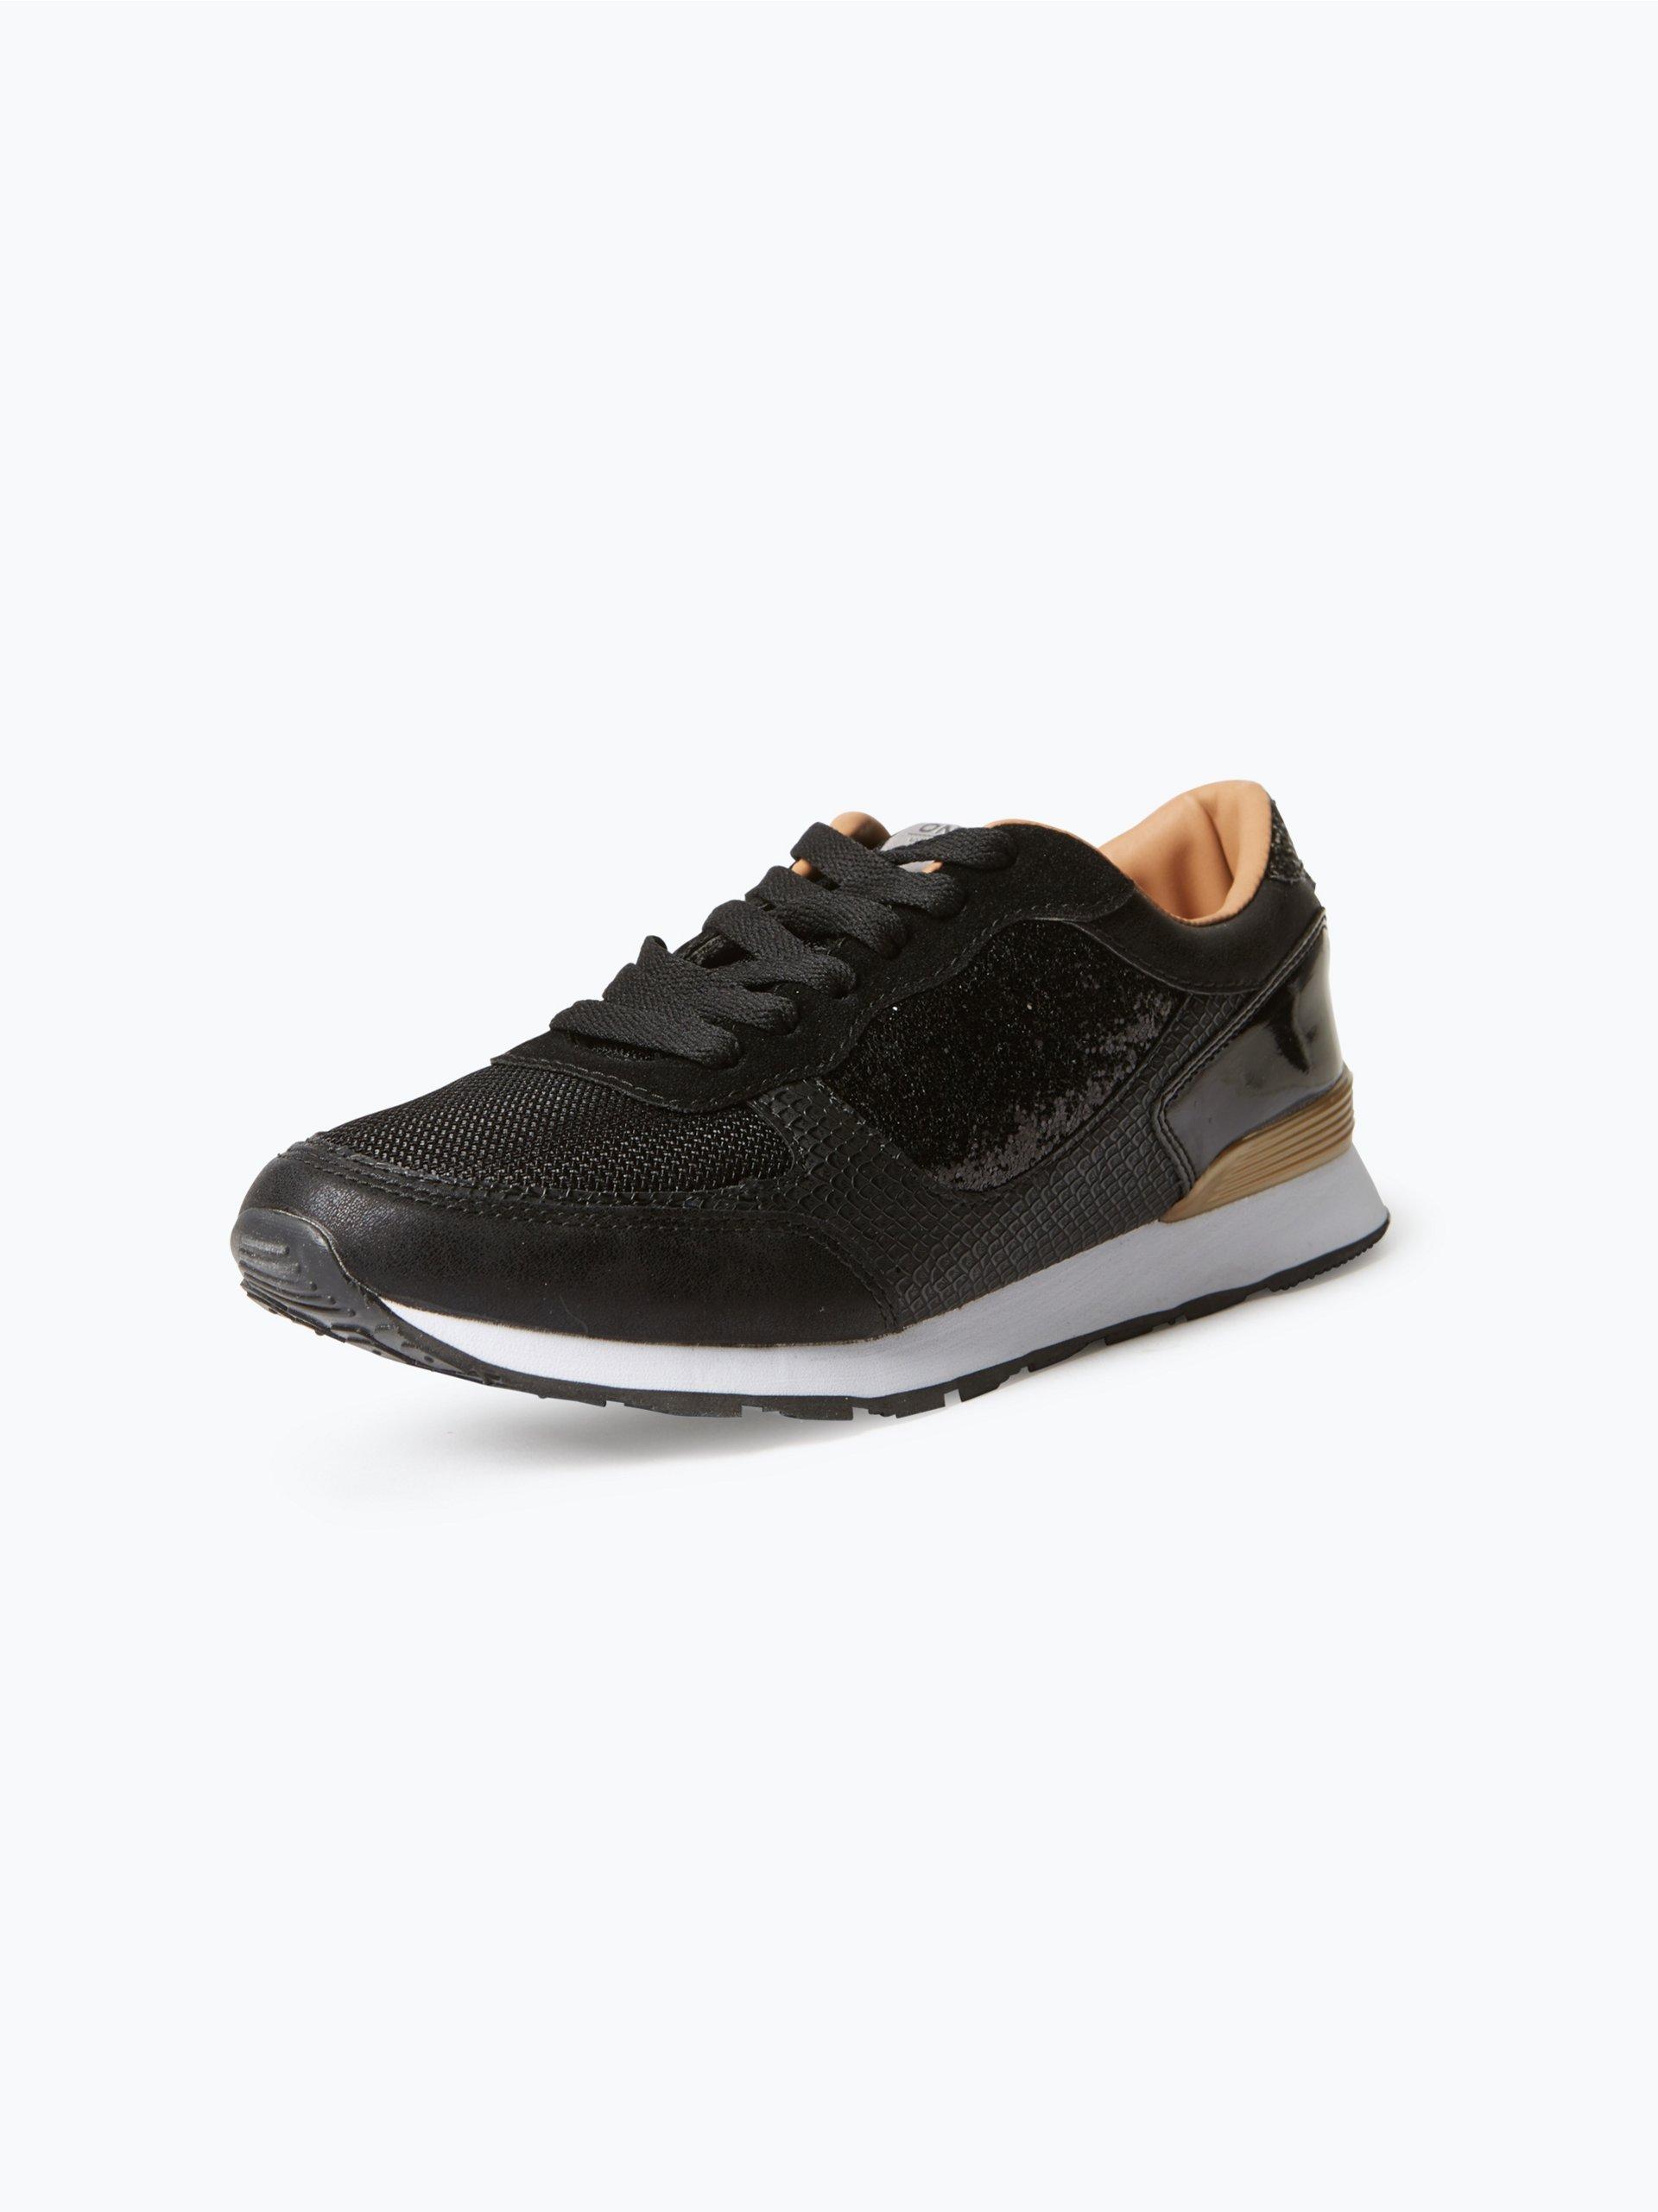 Only Shoes Tenisówki damskie